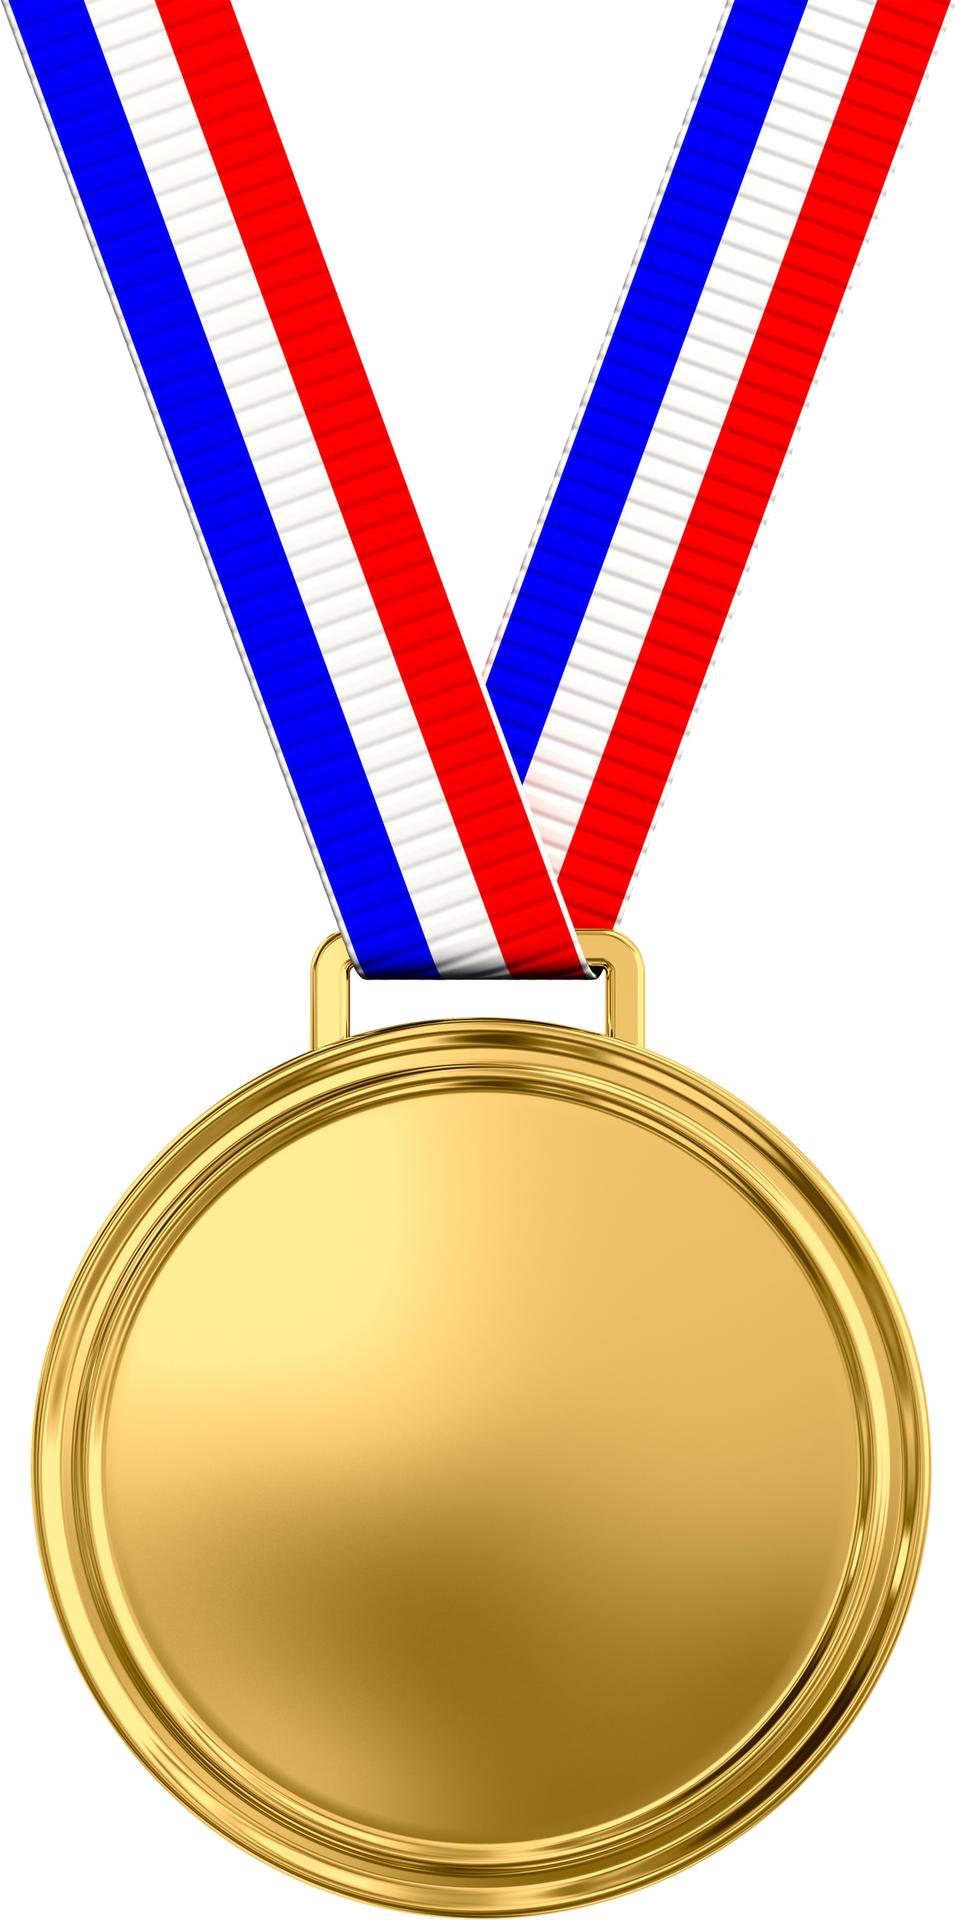 gold medal png image purepng free transparent cc0 png